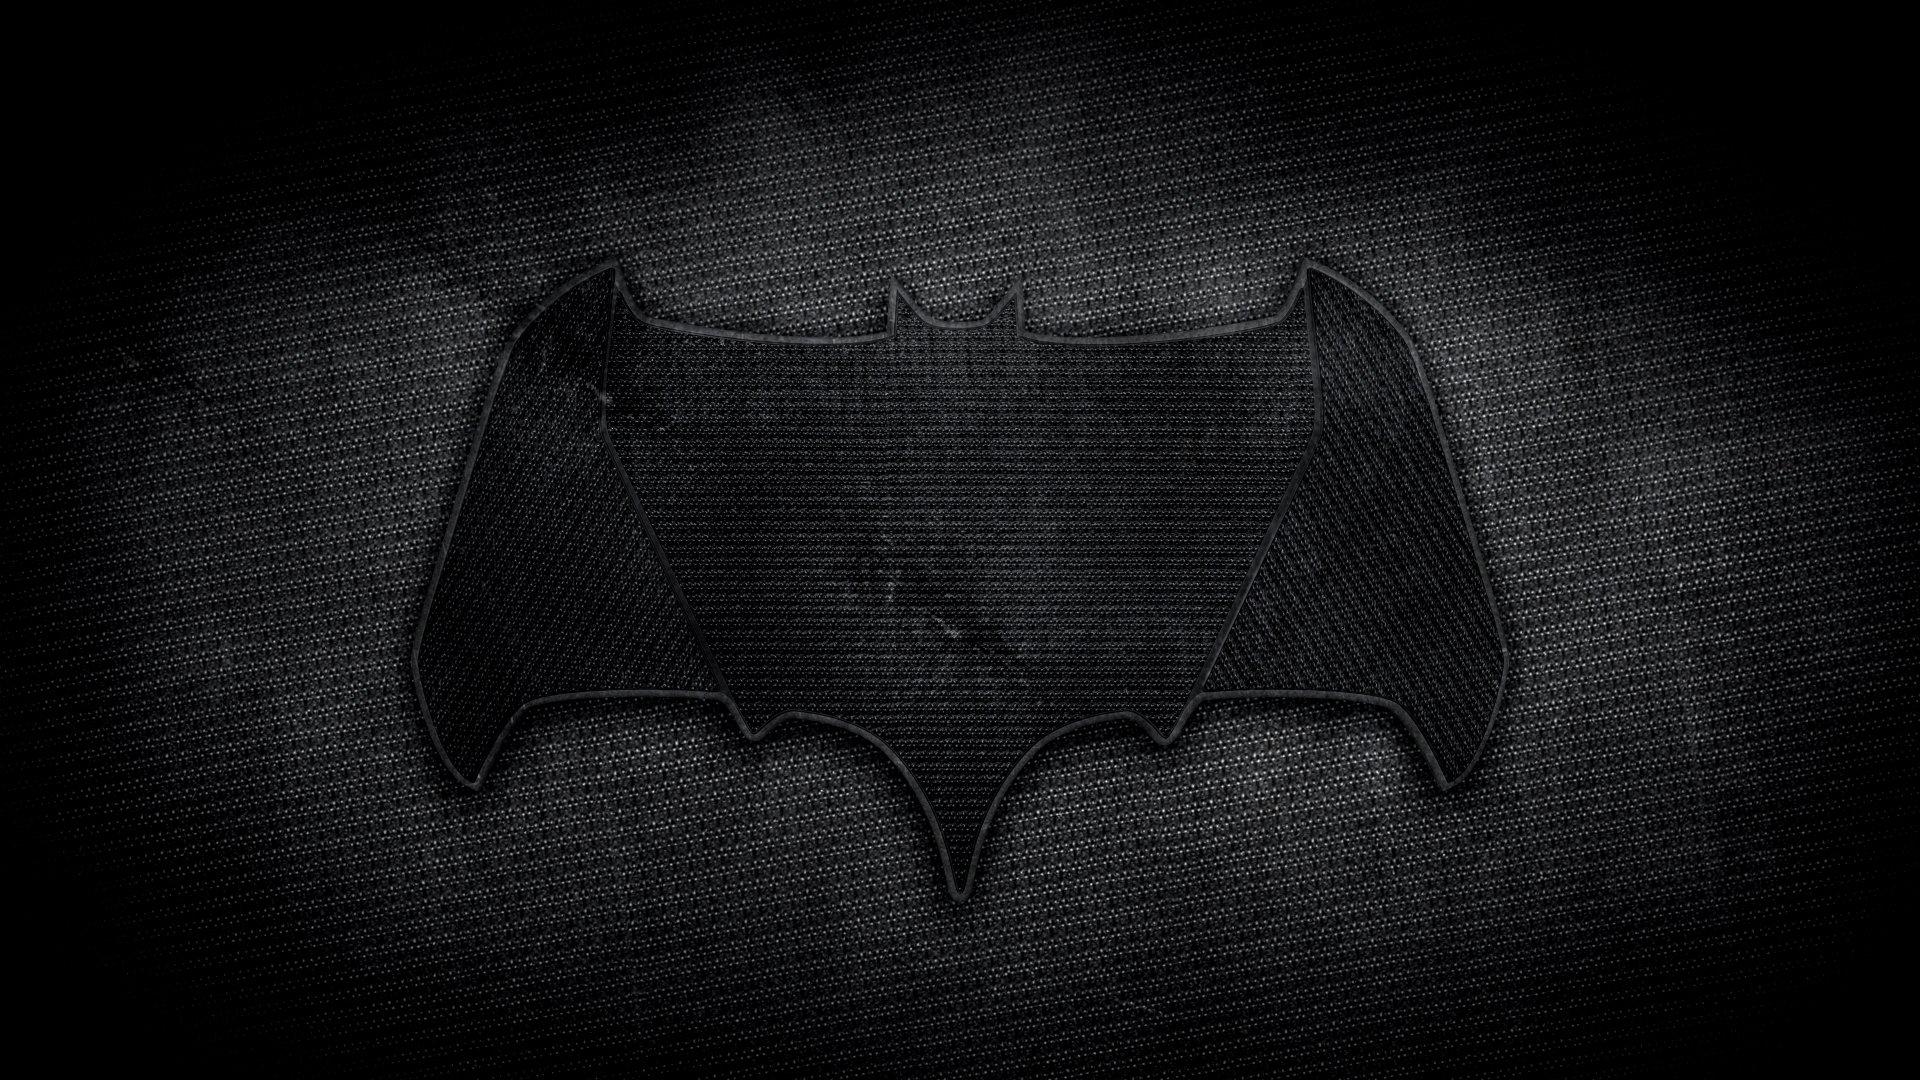 batman logo in batman vs superman dawn of justice movie 2016 1920x1080